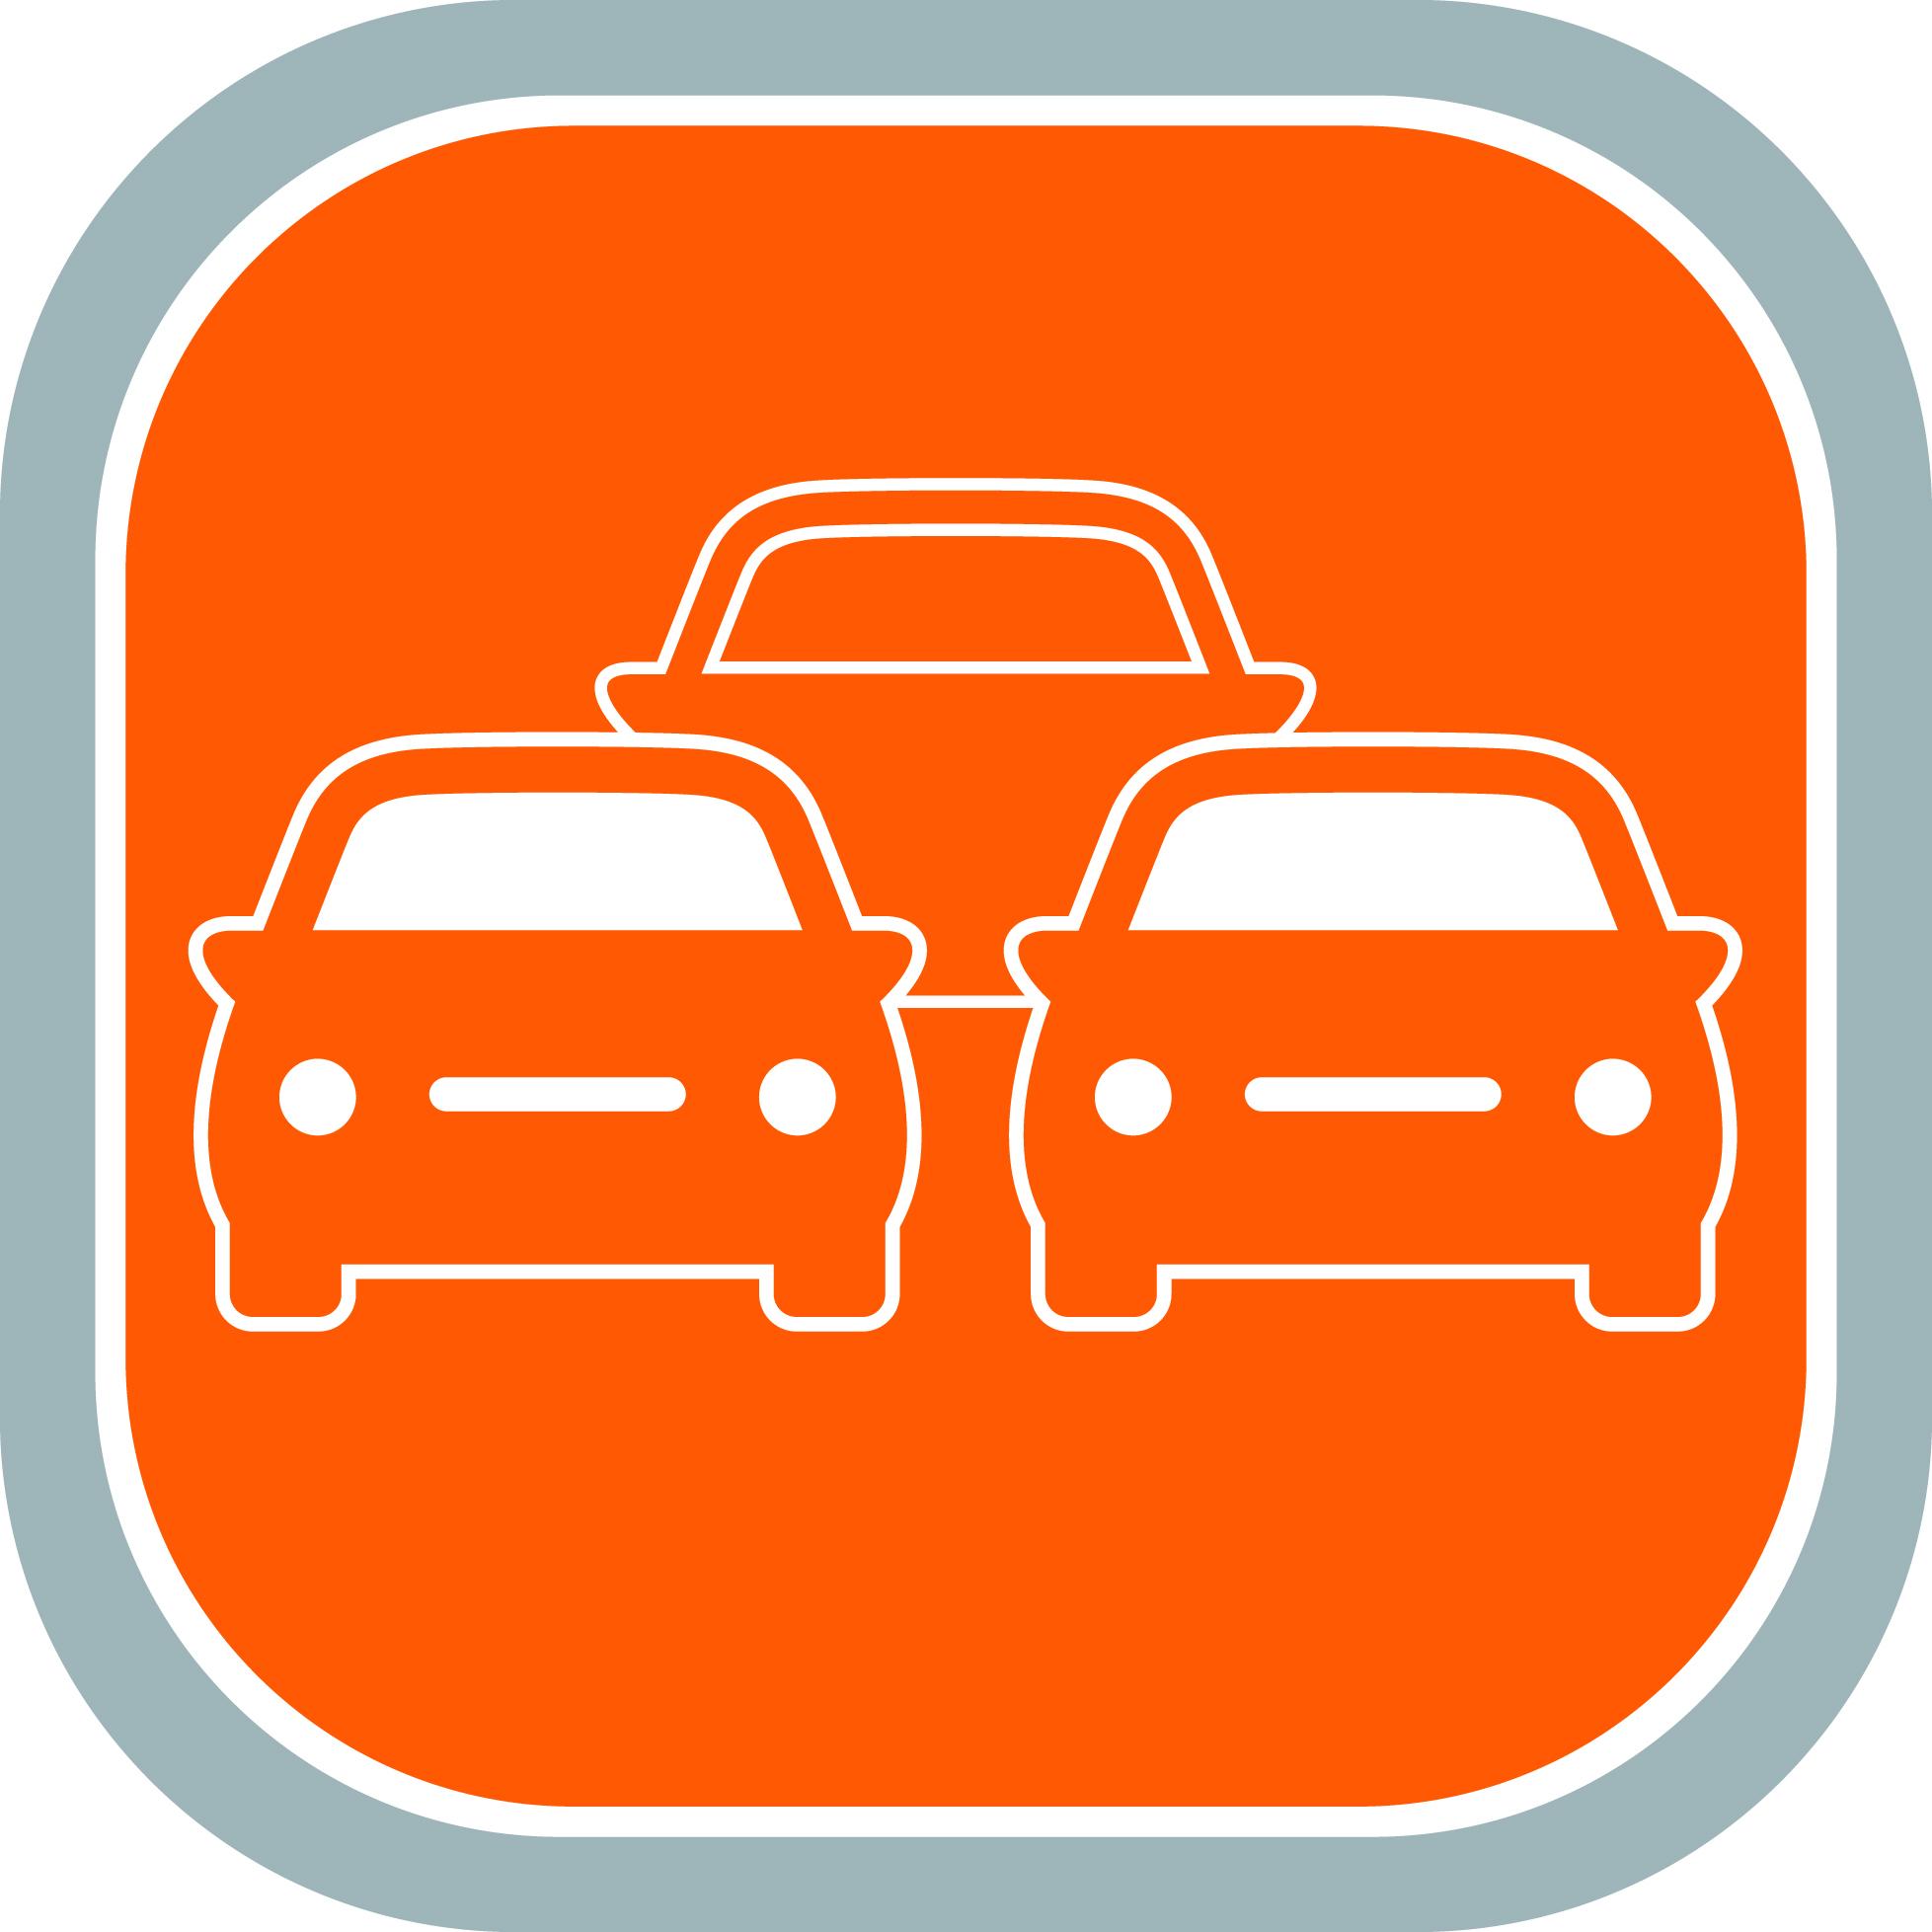 Náhradní vozidlo logo